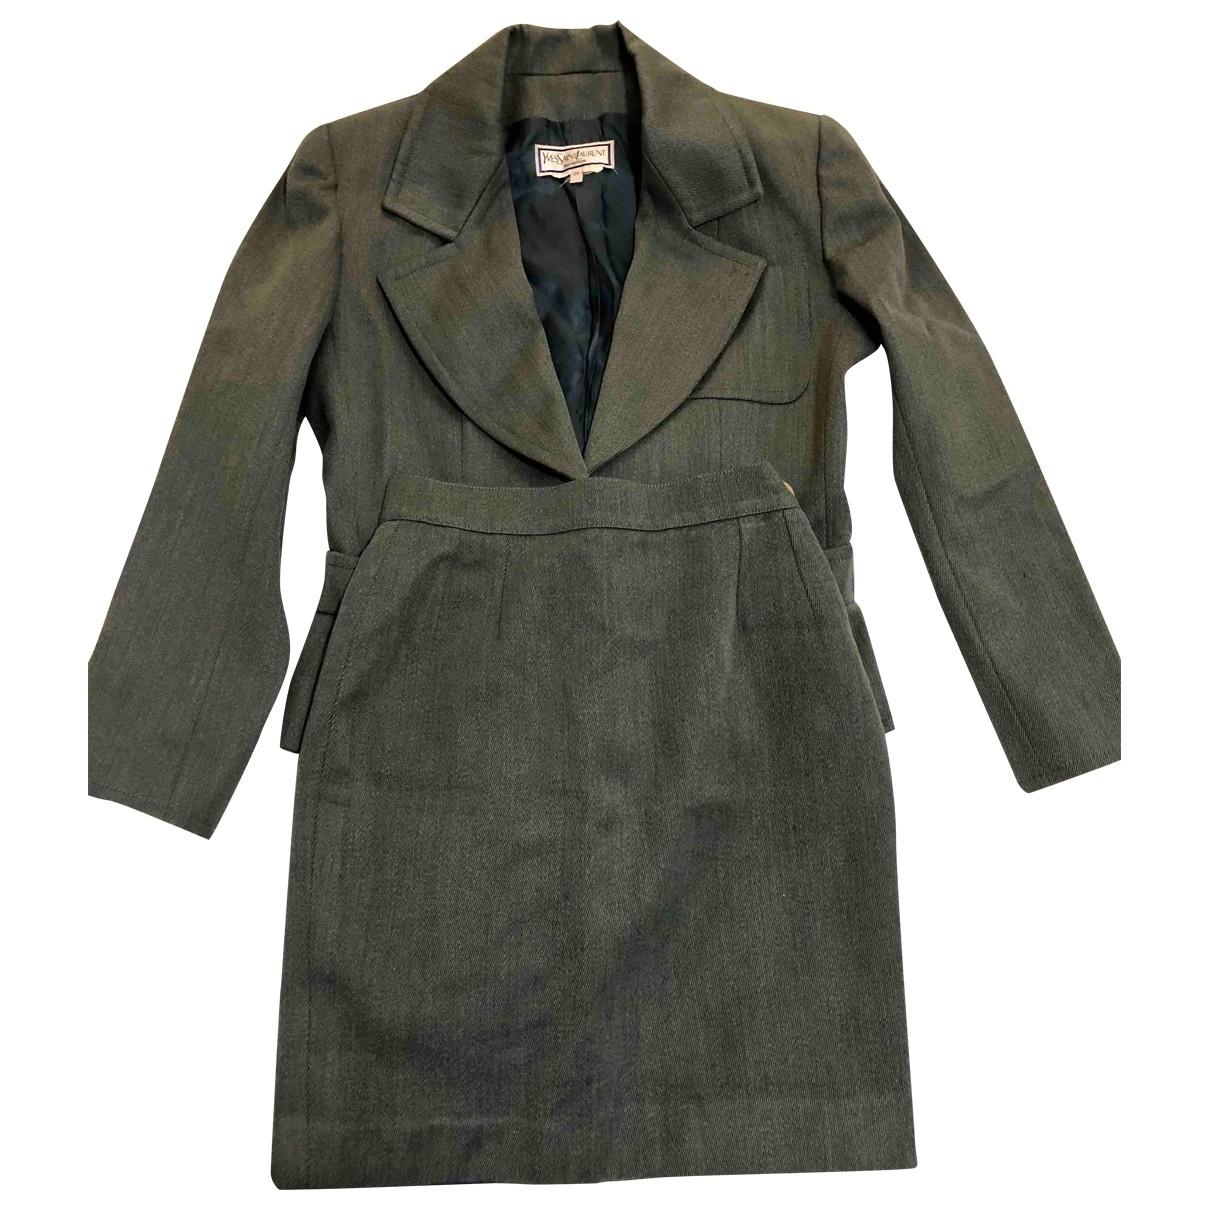 Yves Saint Laurent \N Wool jacket for Women 38 FR